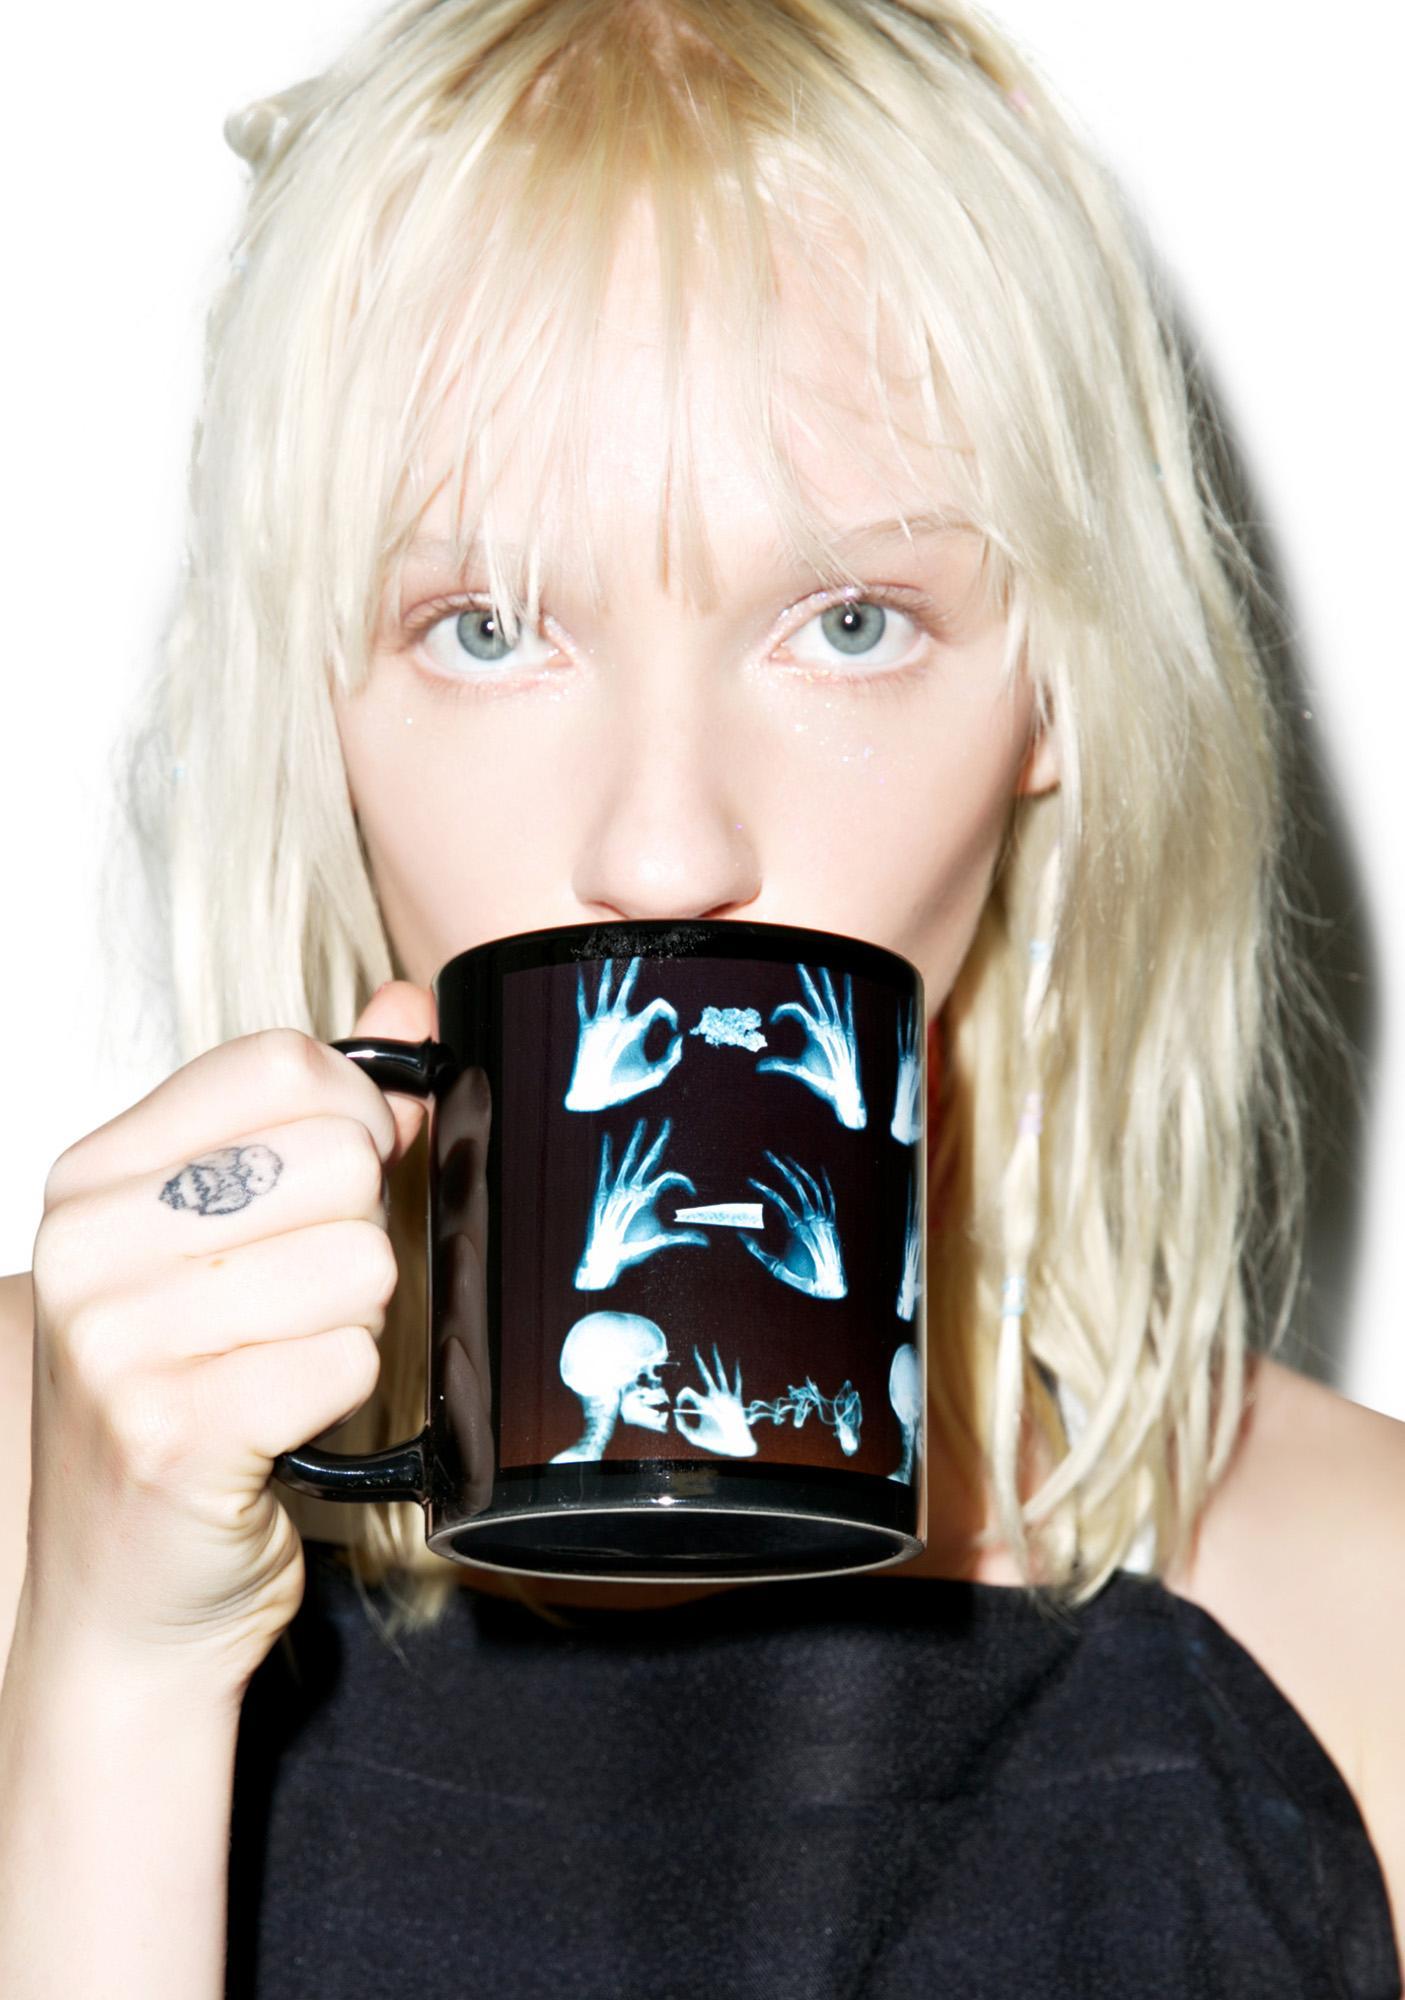 Coffee 'n' Nugs Mug